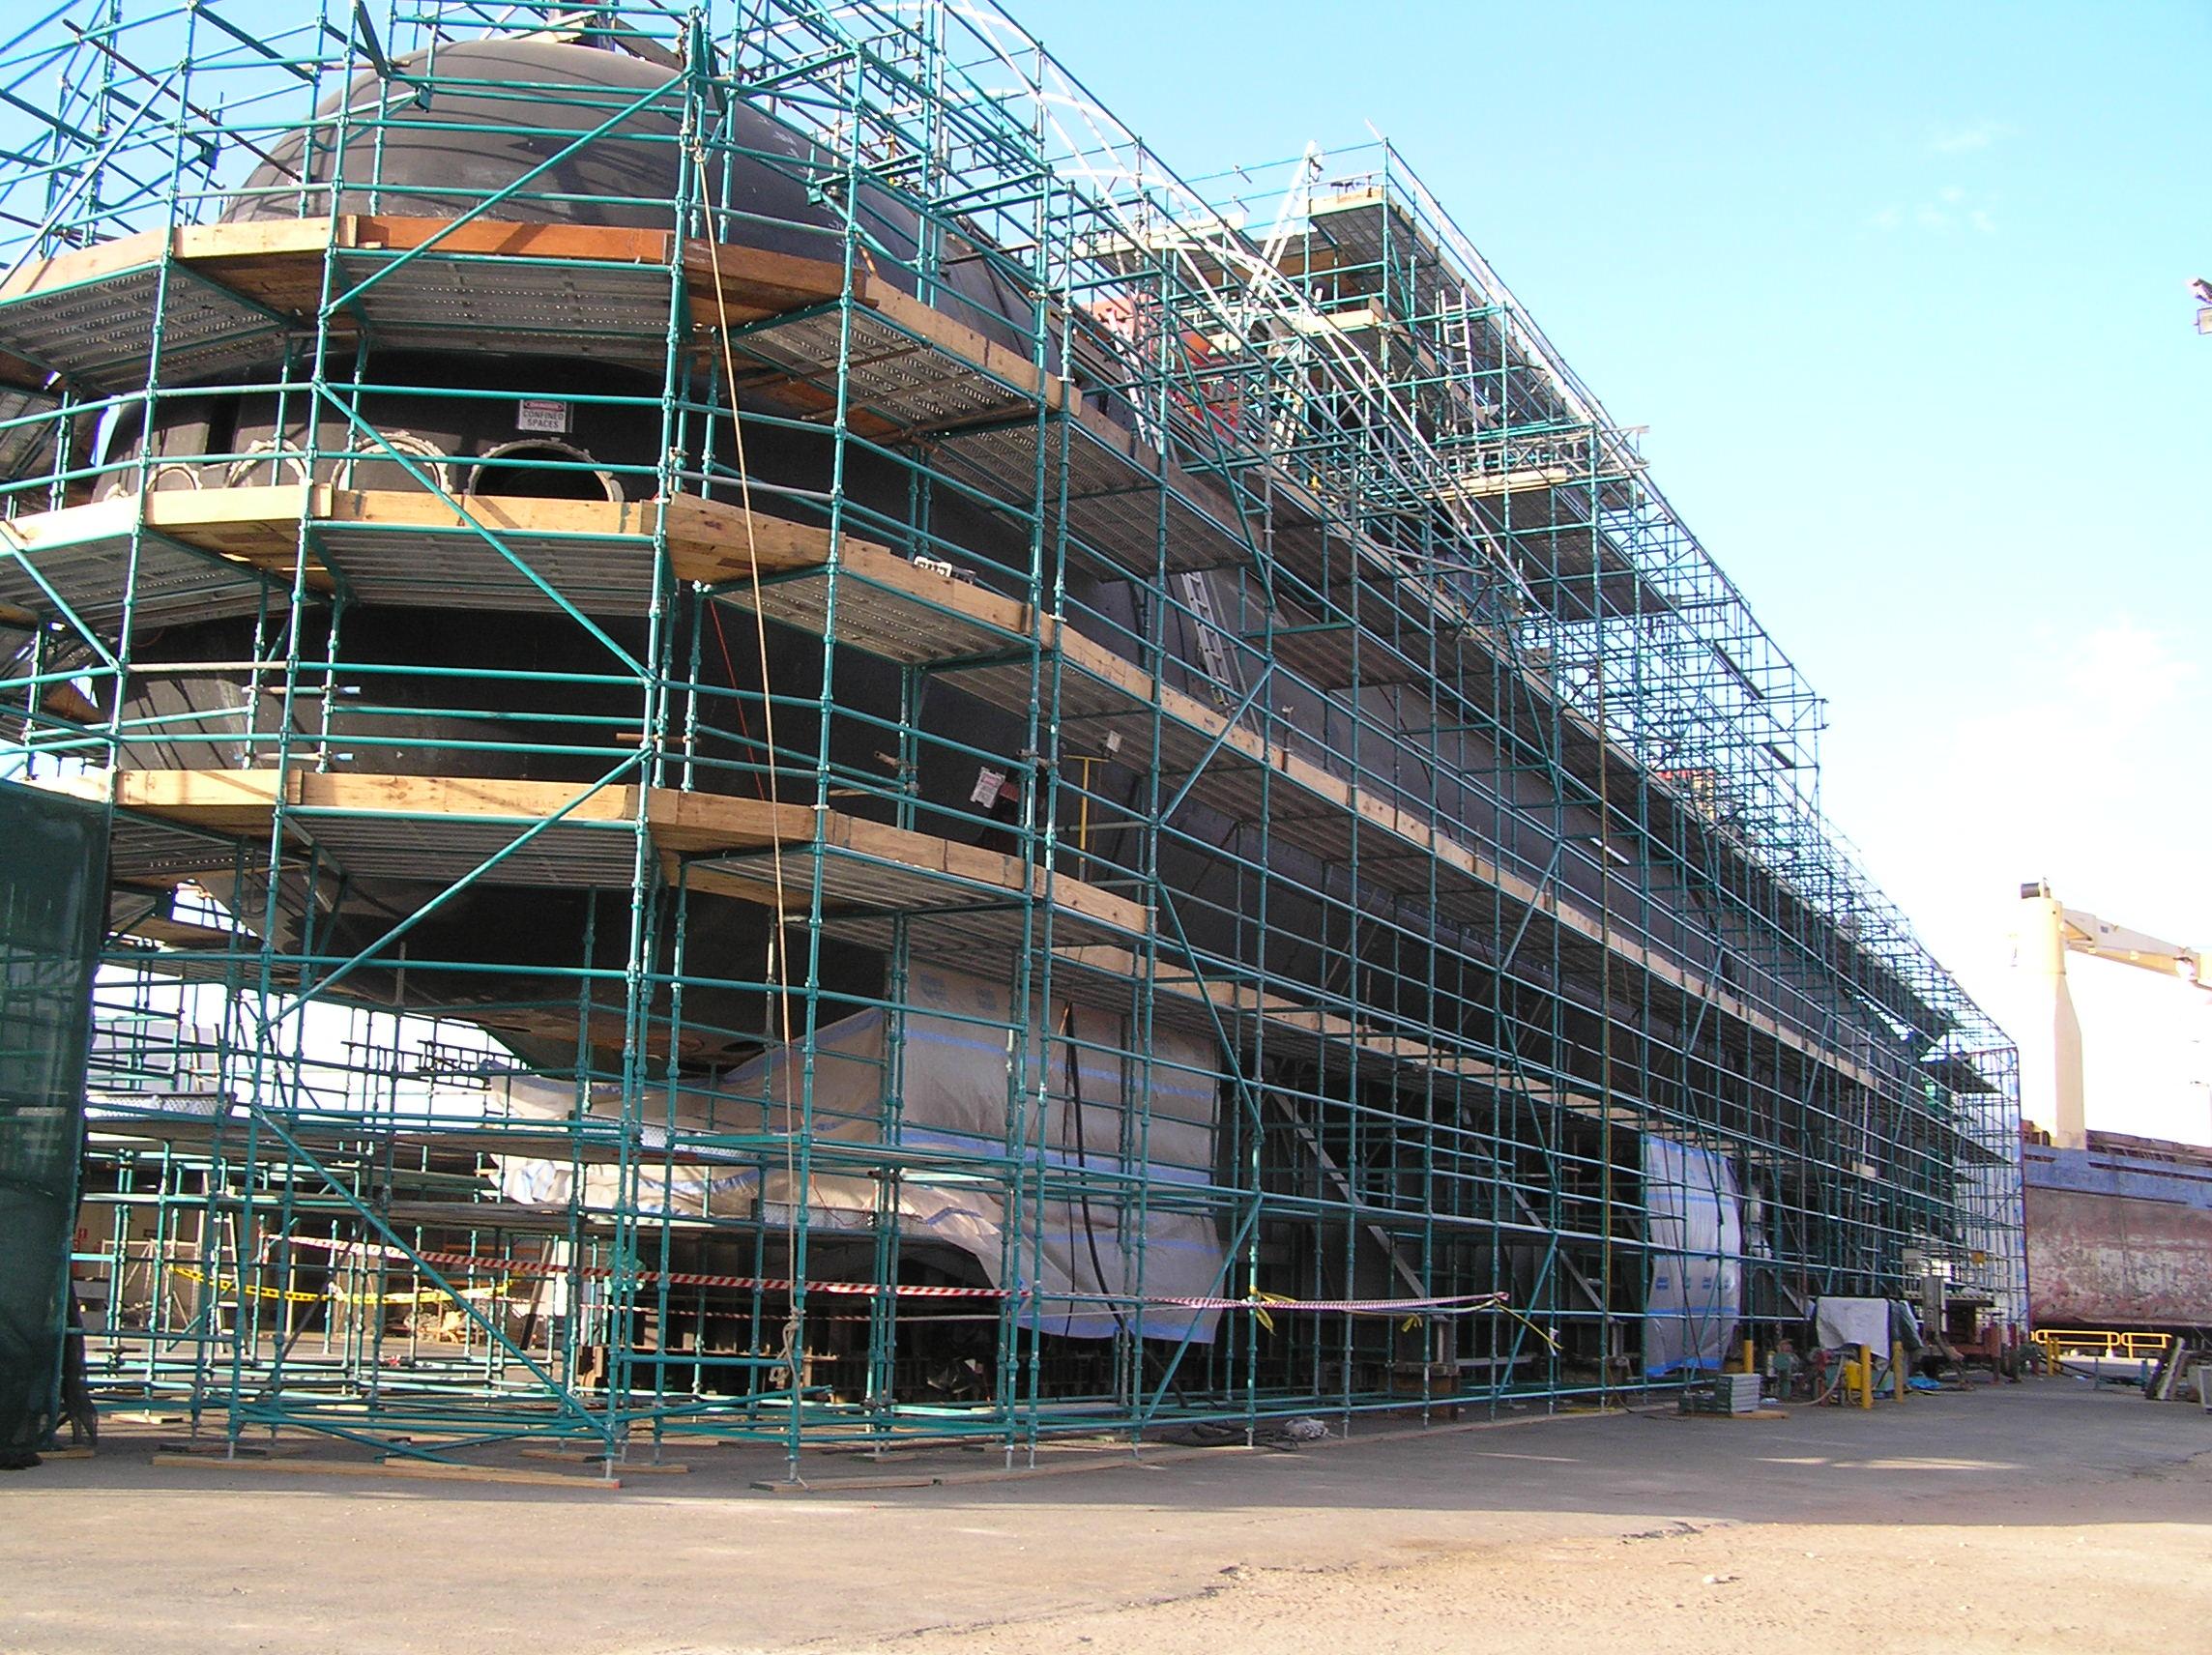 Universal Scaffolding Submarine : Gallery scaffolding hire perth western australia orvad wa